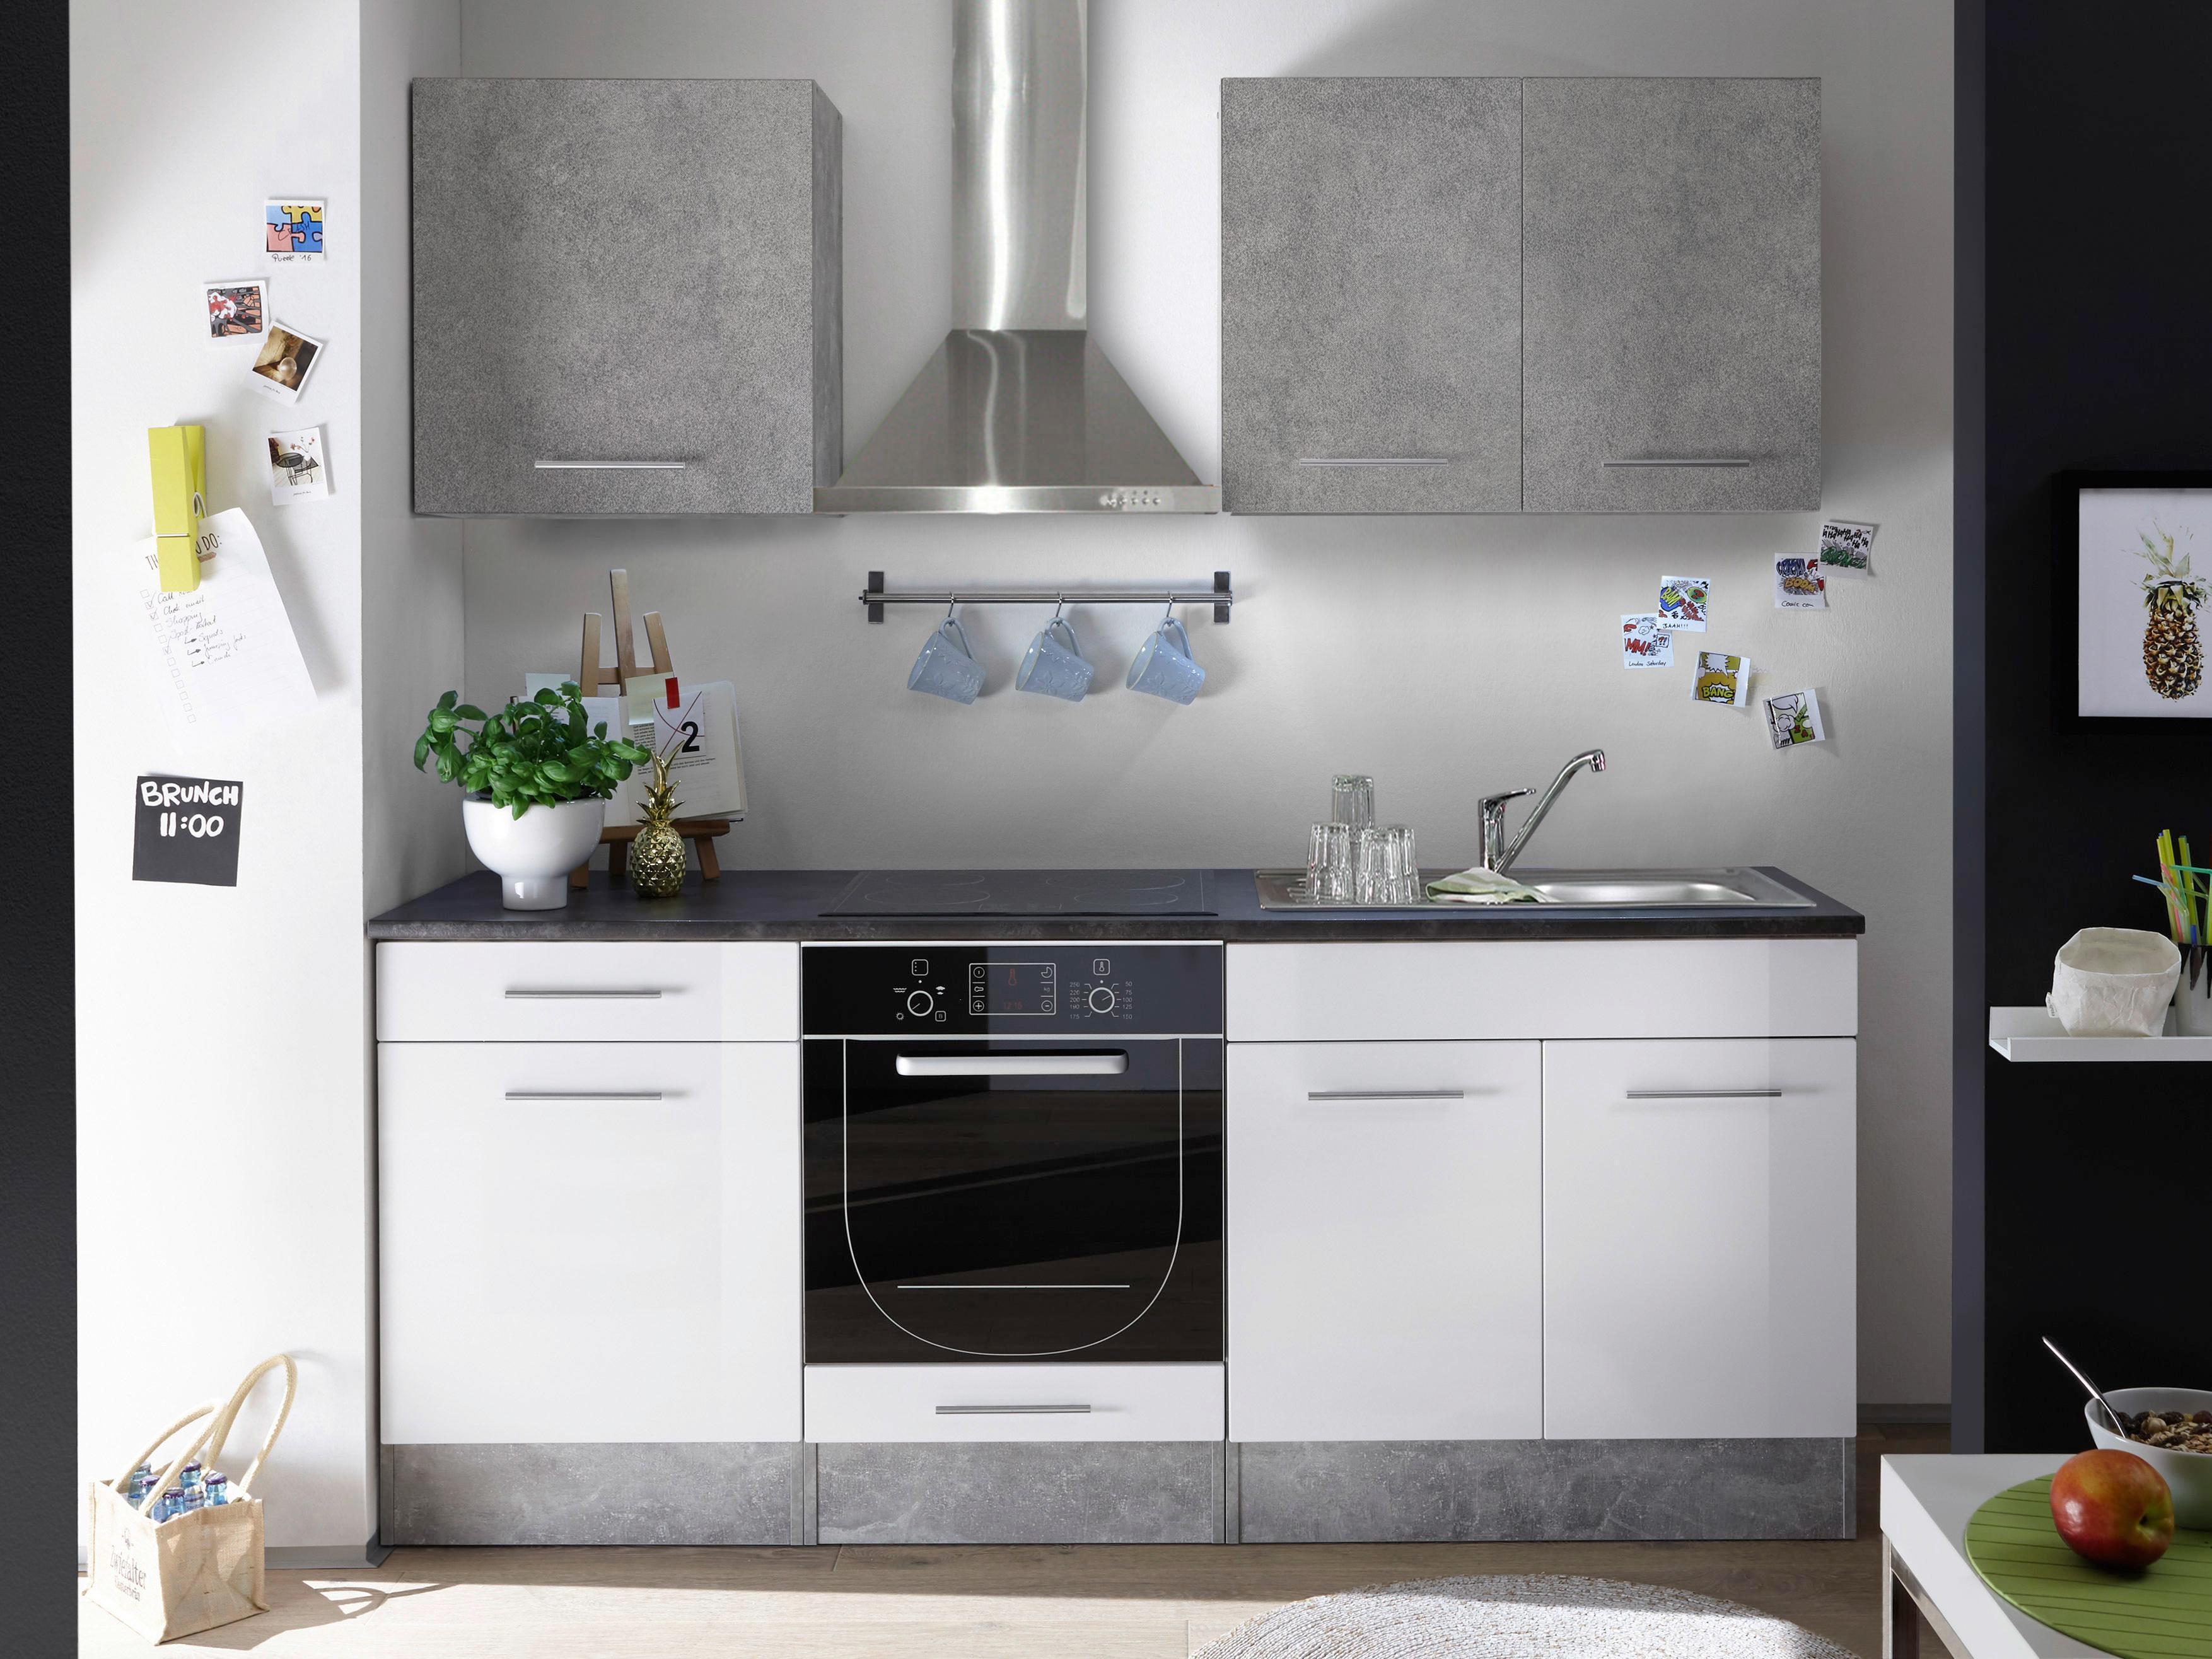 Mini Kühlschrank Möbelix : Küchenblock welcome stone mini cm beton weiß online kaufen